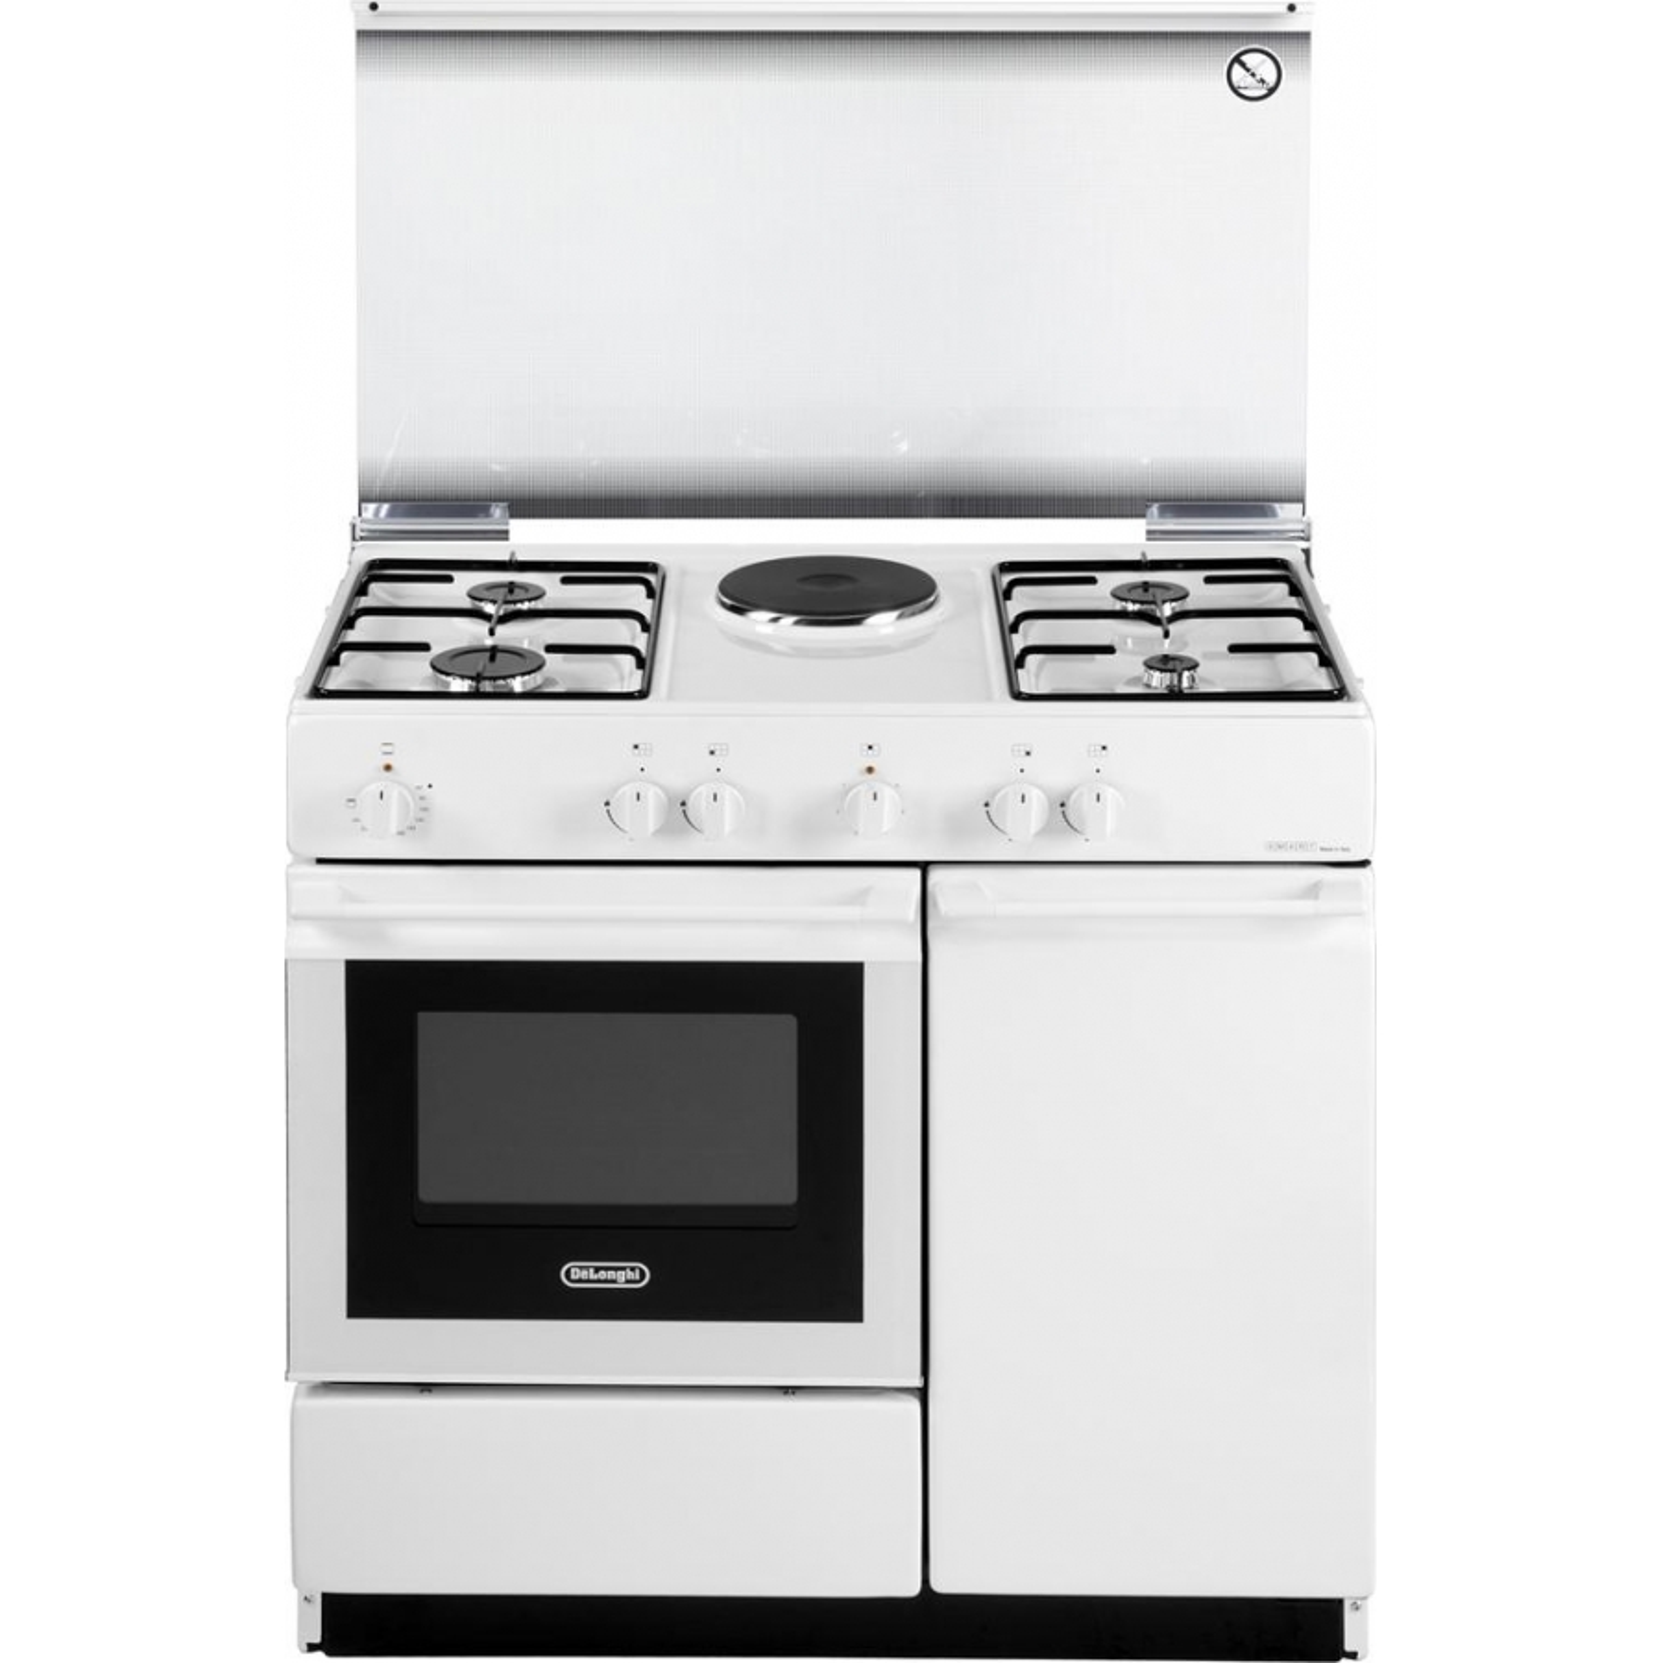 Cucina de longhi sew8541n bianca 86x50 4 fuochi 1 piastra forno elettrico garanzia italia - Cucine a gas samsung ...